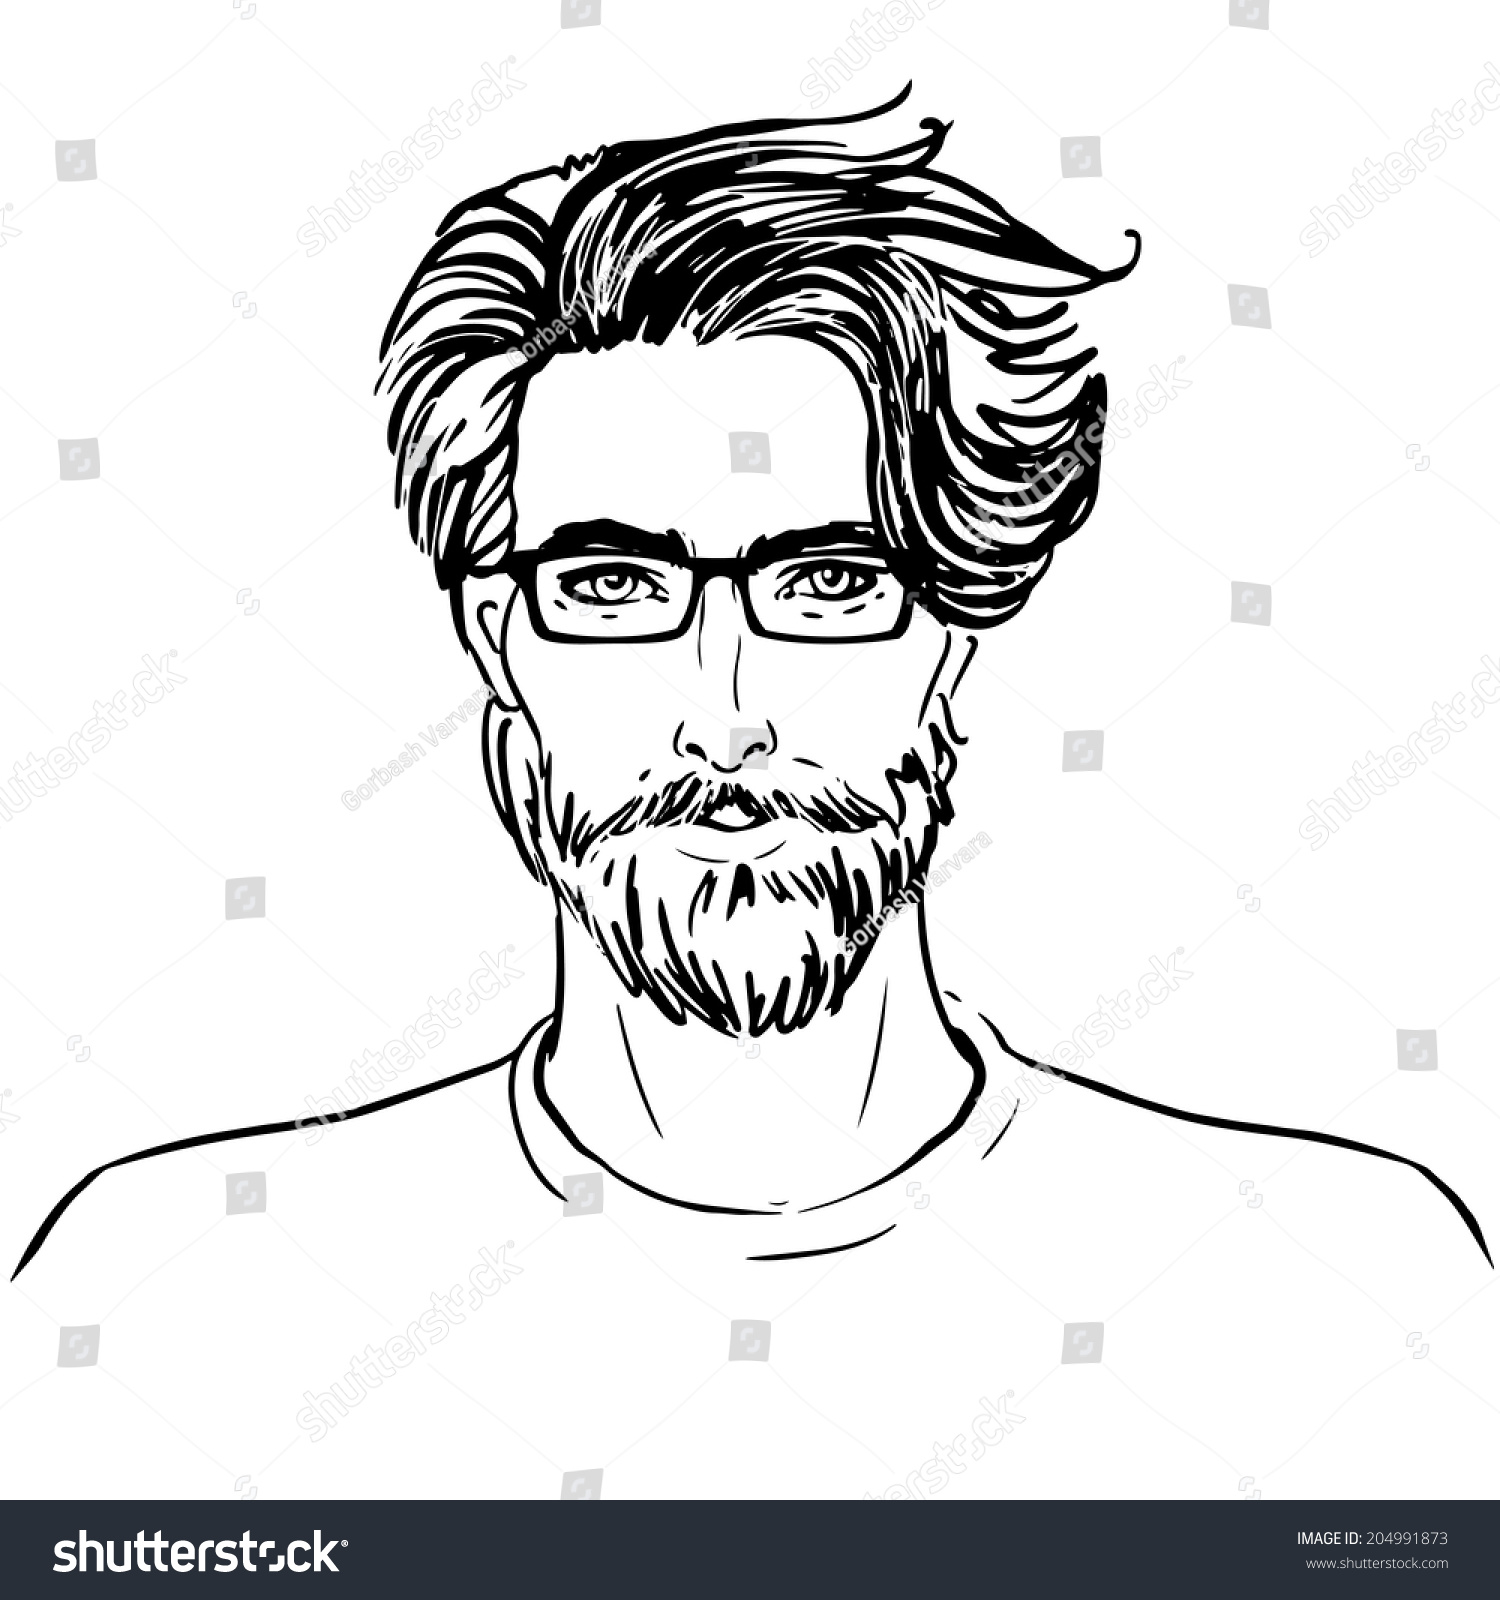 Hipster Vector Man Face Beard Glasses Stock Vector ...